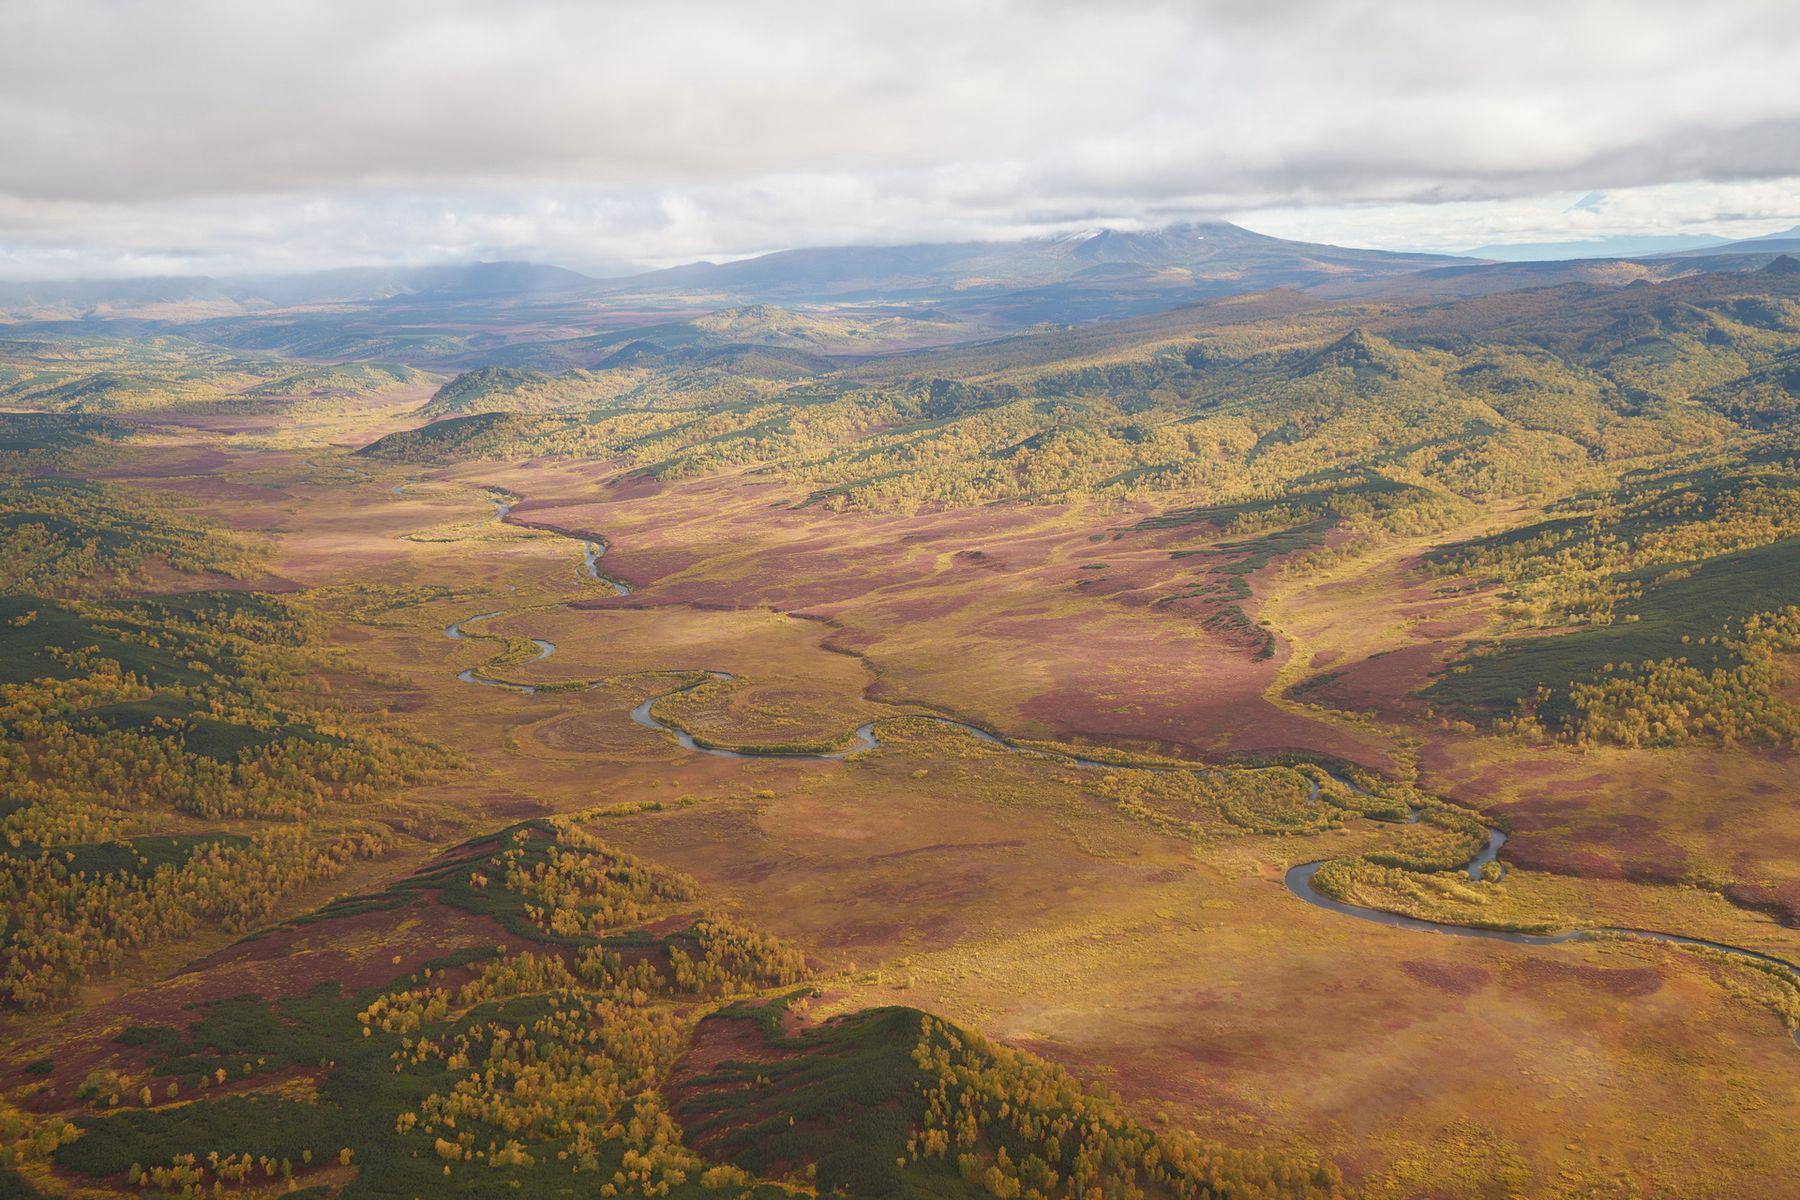 Долина реки Левая Жупанова Камчатка Осень Жупаново ЛеваяЖупаново Долина SAL1635Z